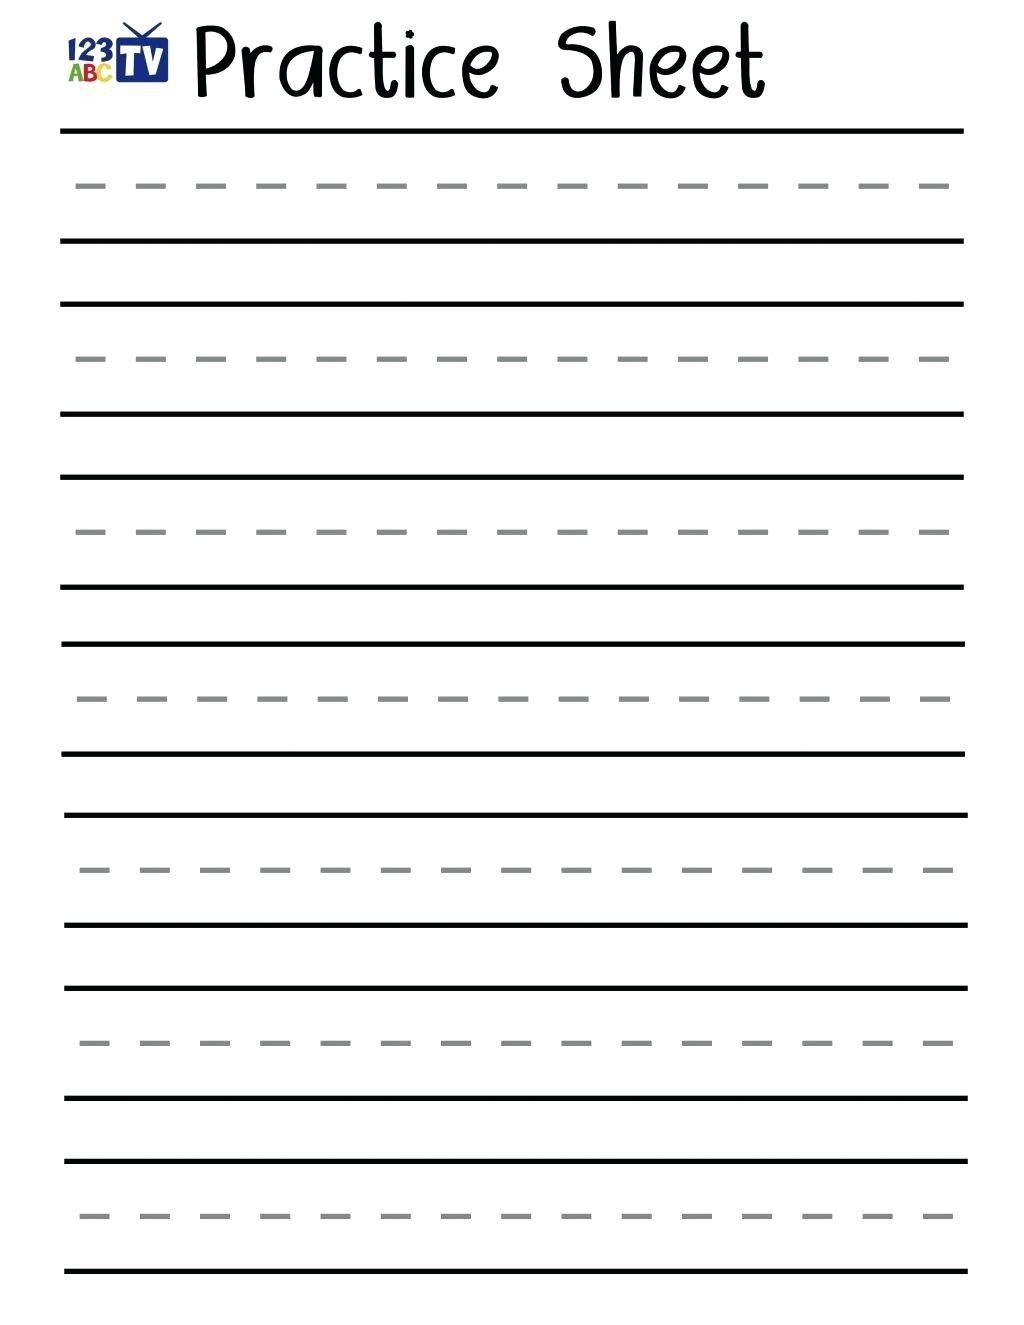 Blank Handwriting Worksheets For Kindergarten Worksheet For Kindergarten Handwriting Worksheets Writing Practice Worksheets Free Handwriting Worksheets Writing name exercises for kindergarten